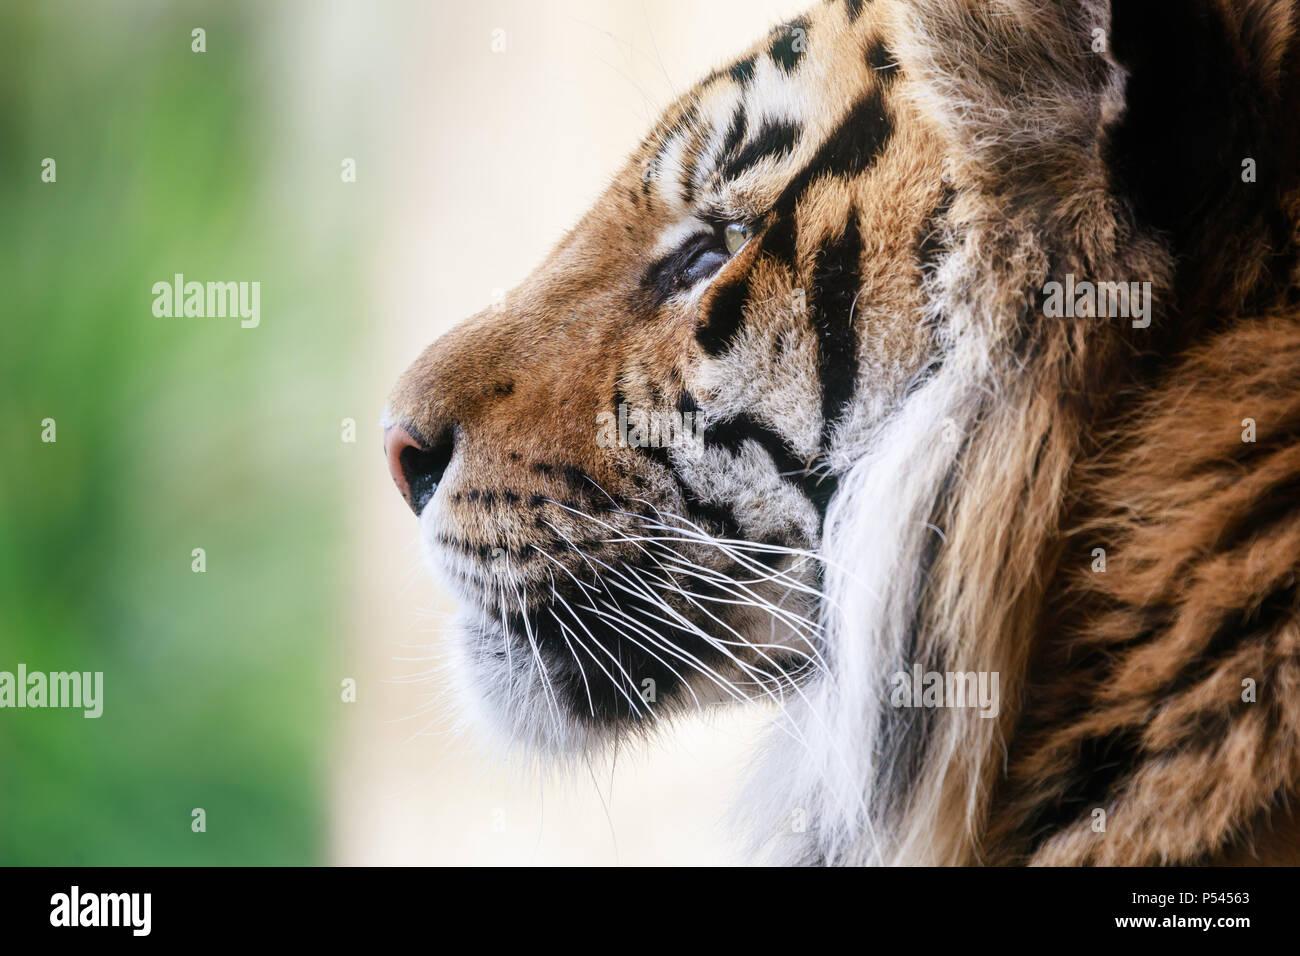 Close up profile portrait of a male Sumatran Tiger - Stock Image